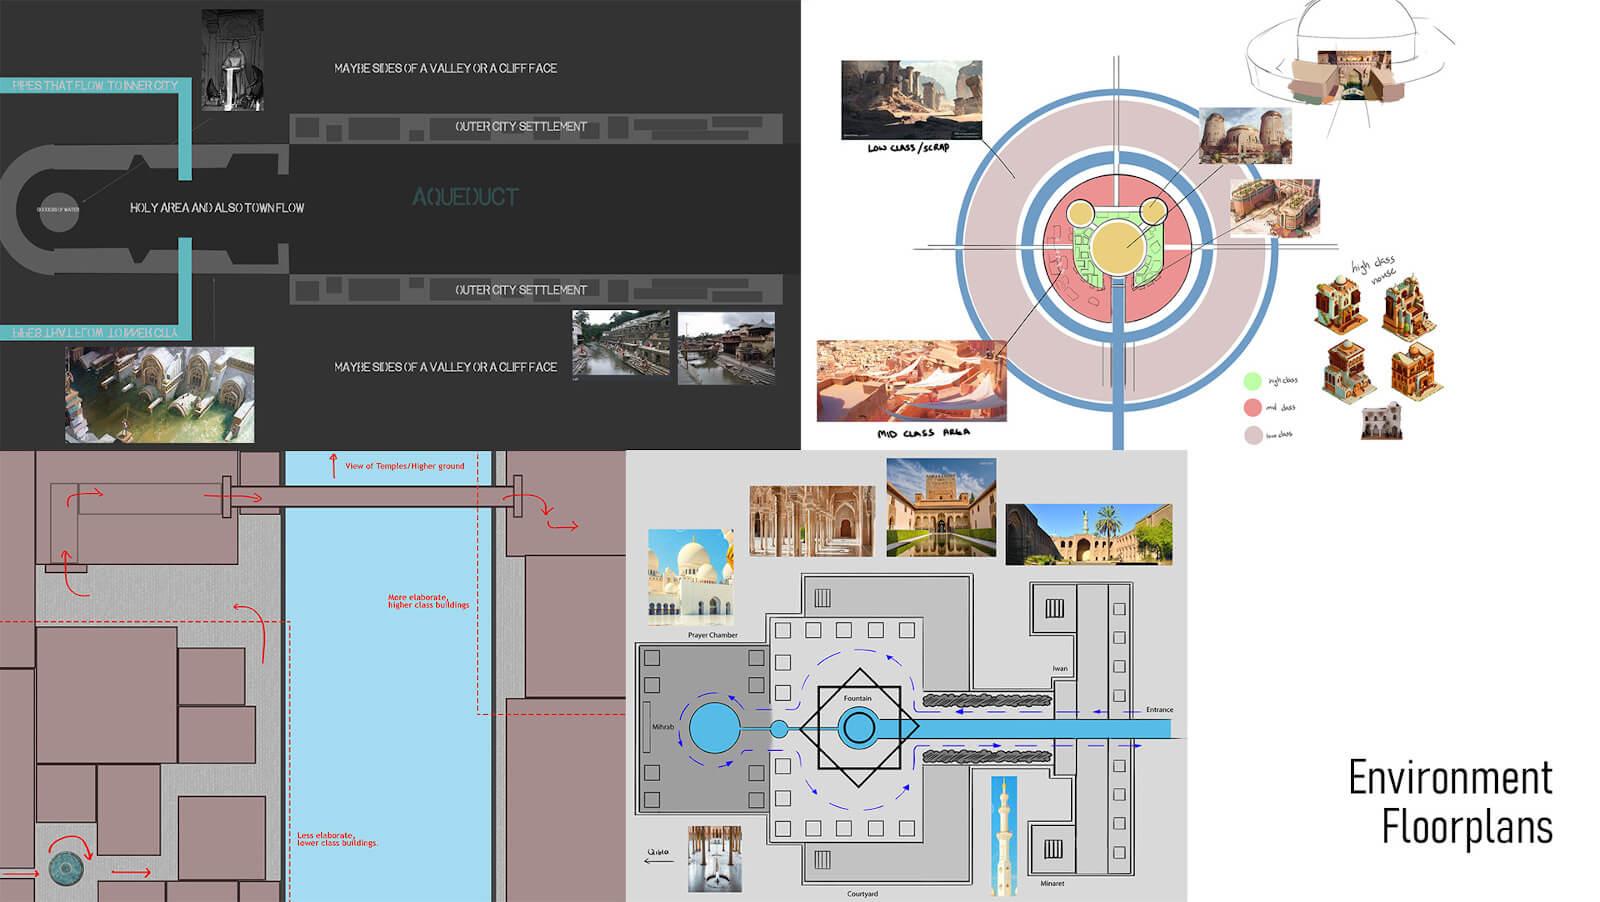 Environment floorplans